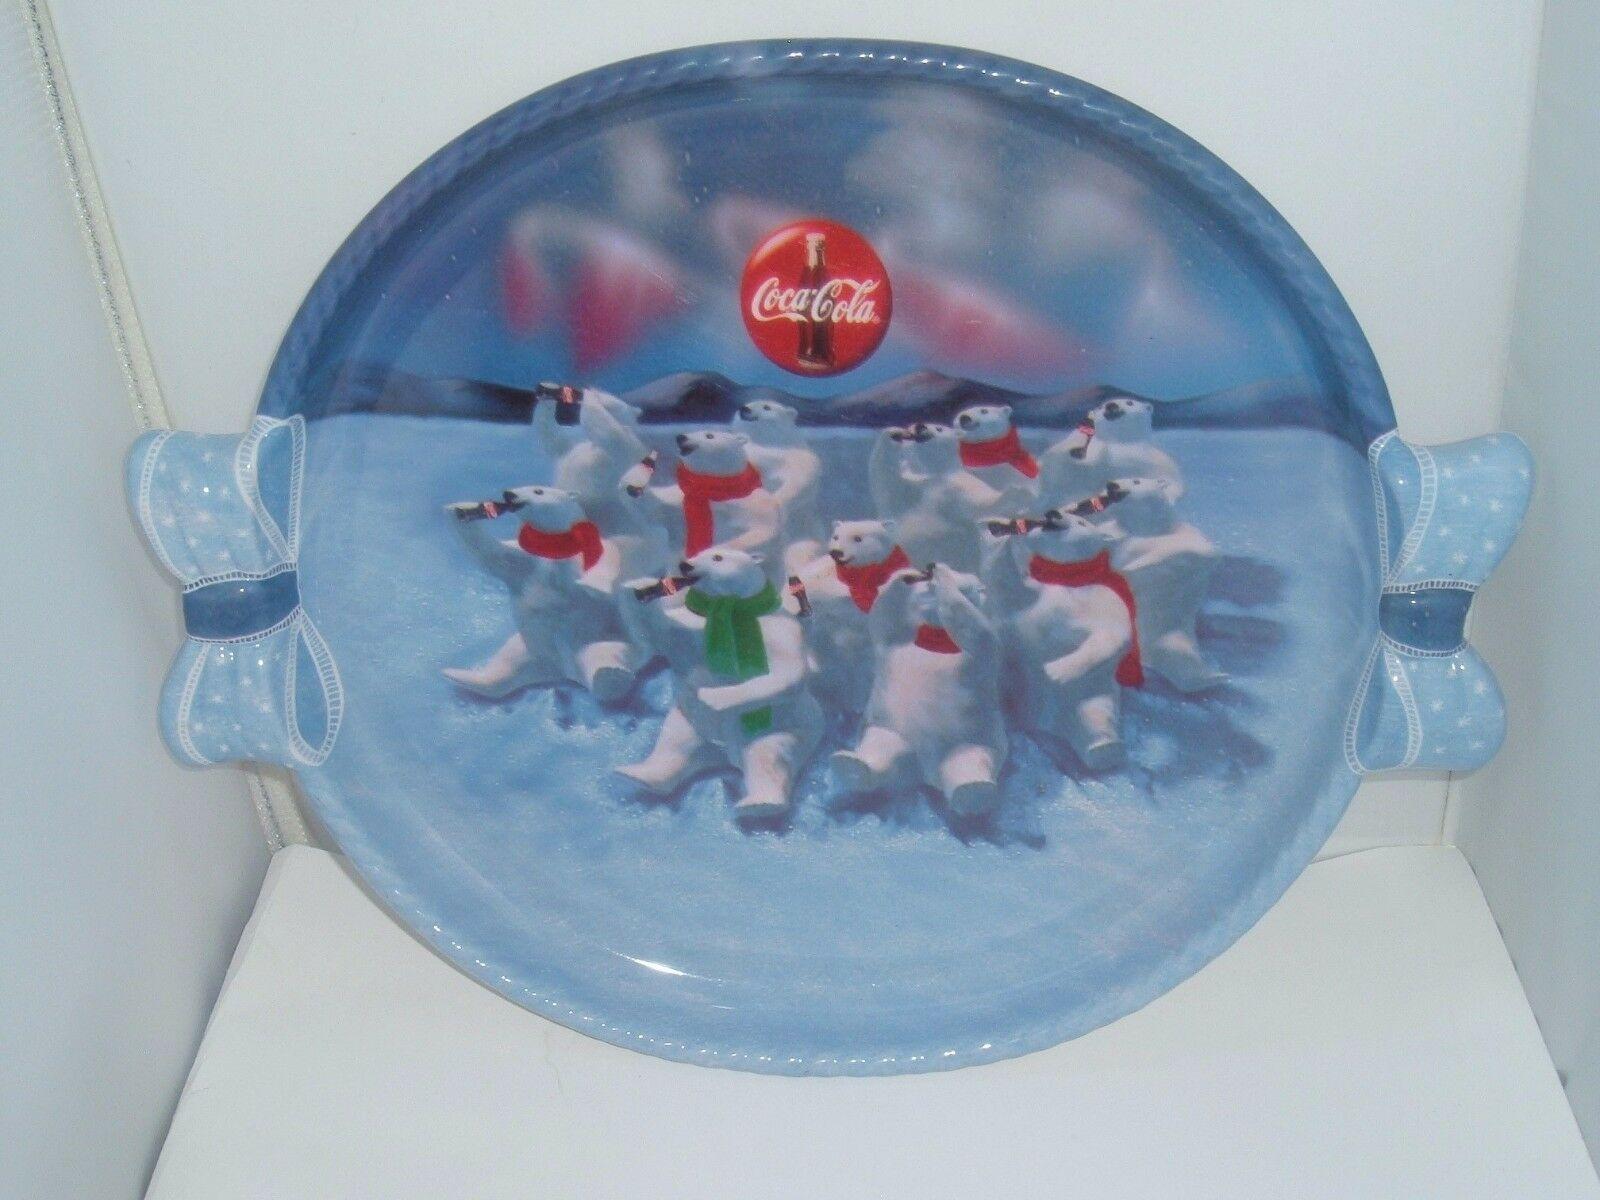 Polar Bear Christmas Holiday 1997 Coke Coca-Cola Winter Plastic Serving Tray - $15.81